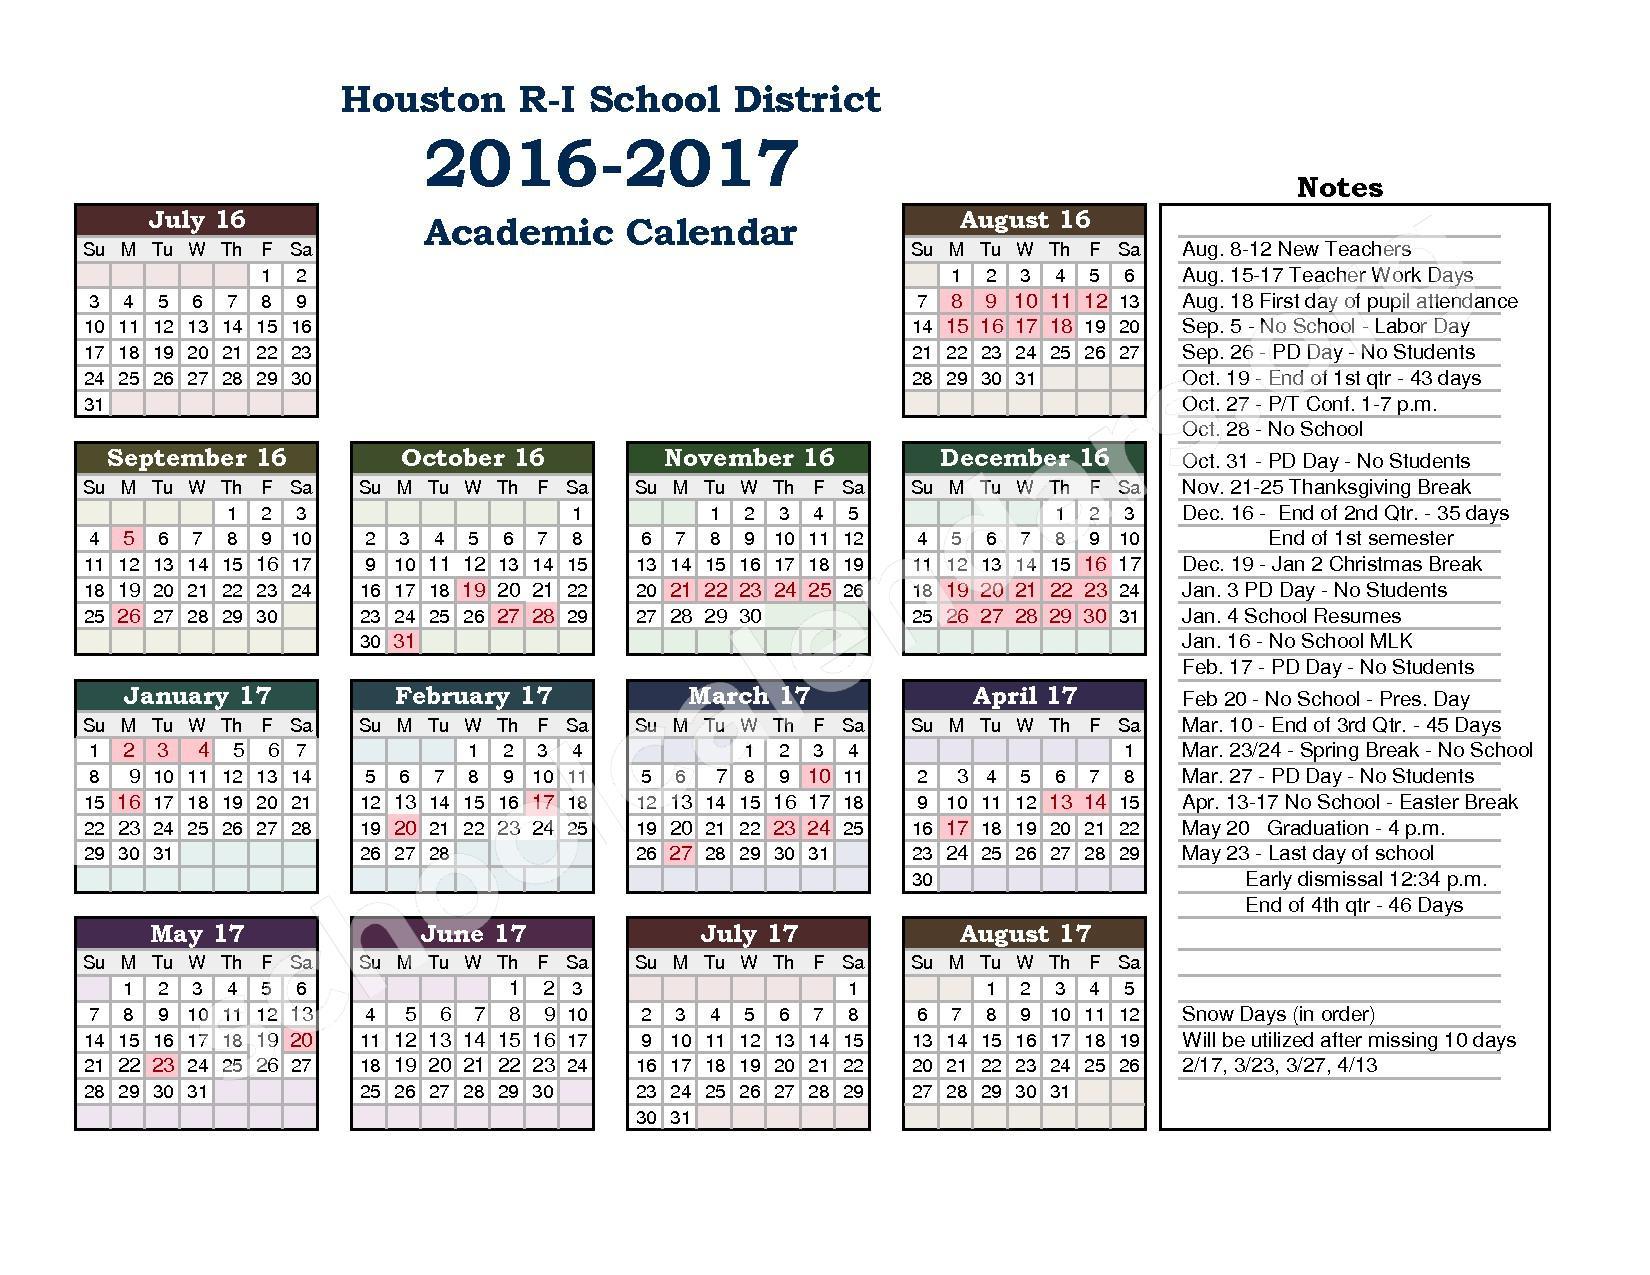 2016 - 2017 School Calendar – Houston R-I School District – page 1